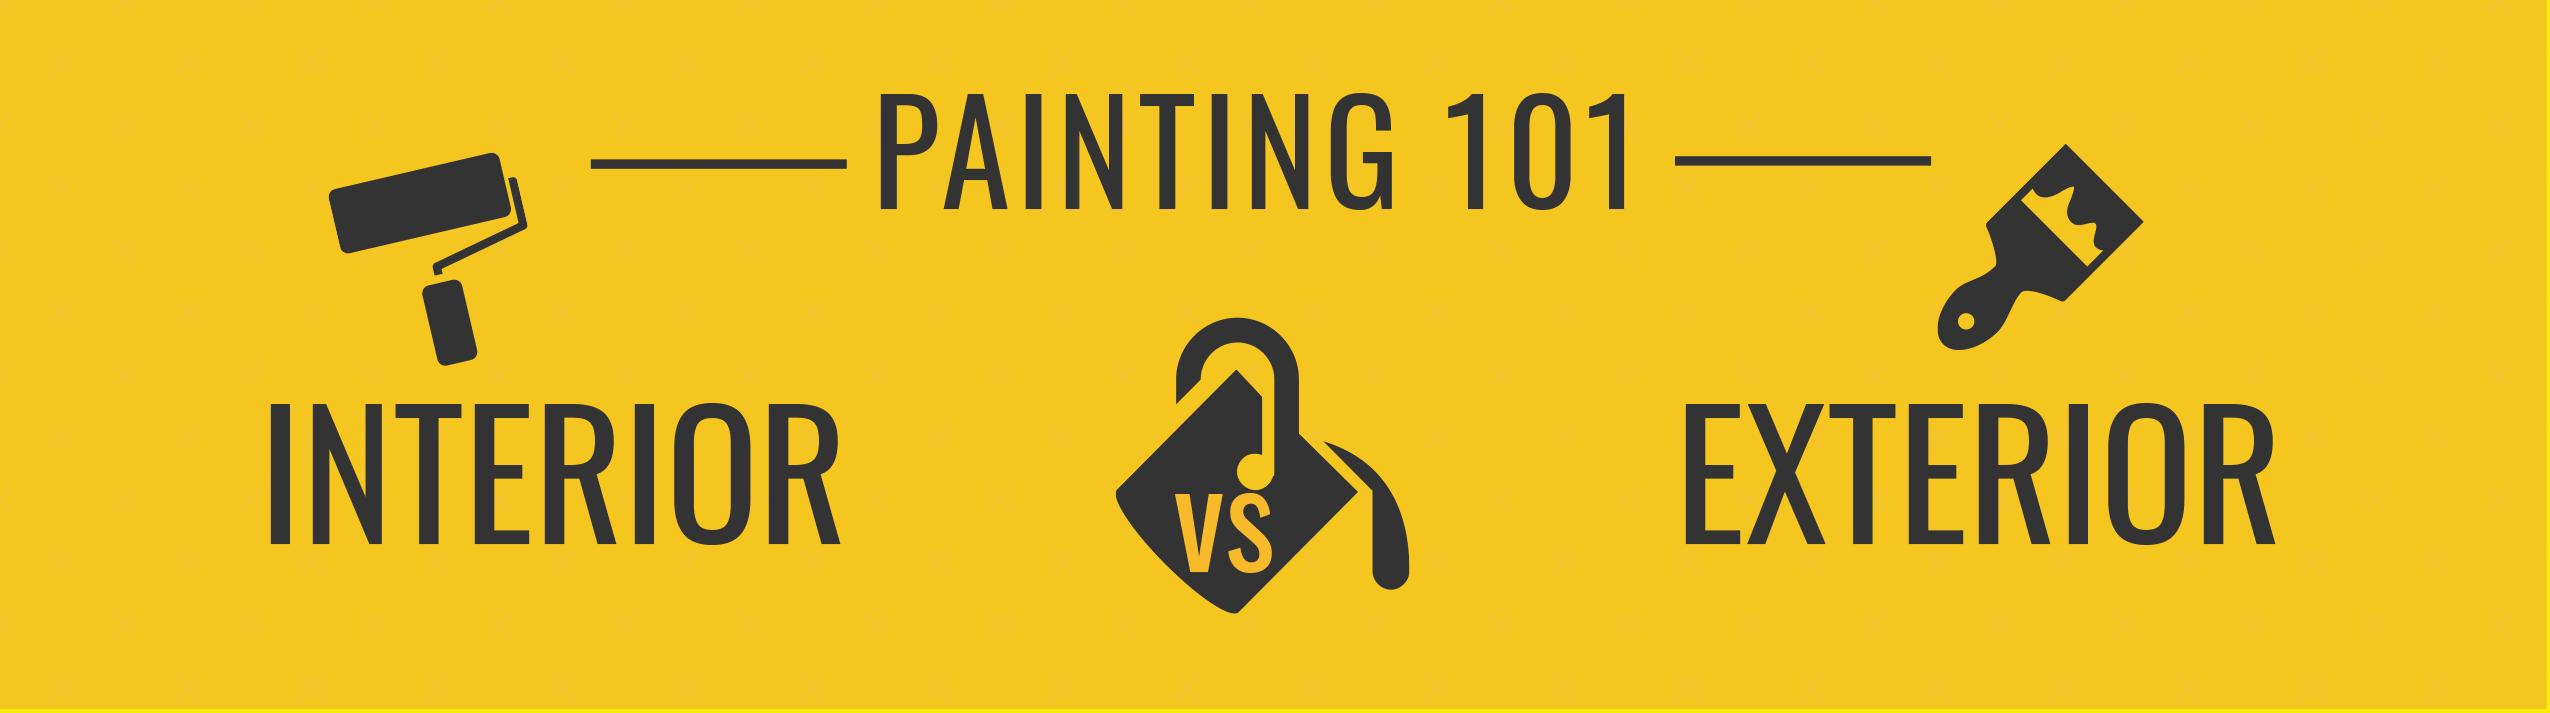 Painting 101: Interior vs. Exterior